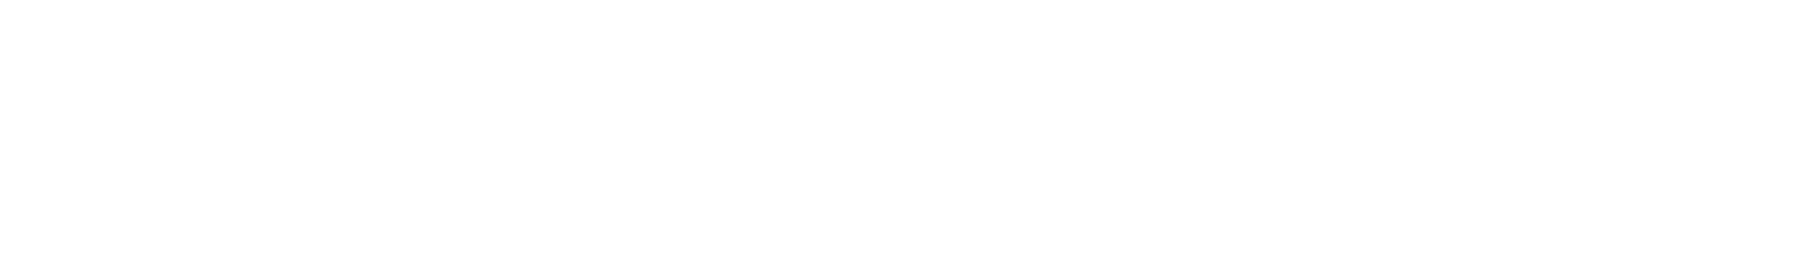 dts chordlp 53 cm7 dry